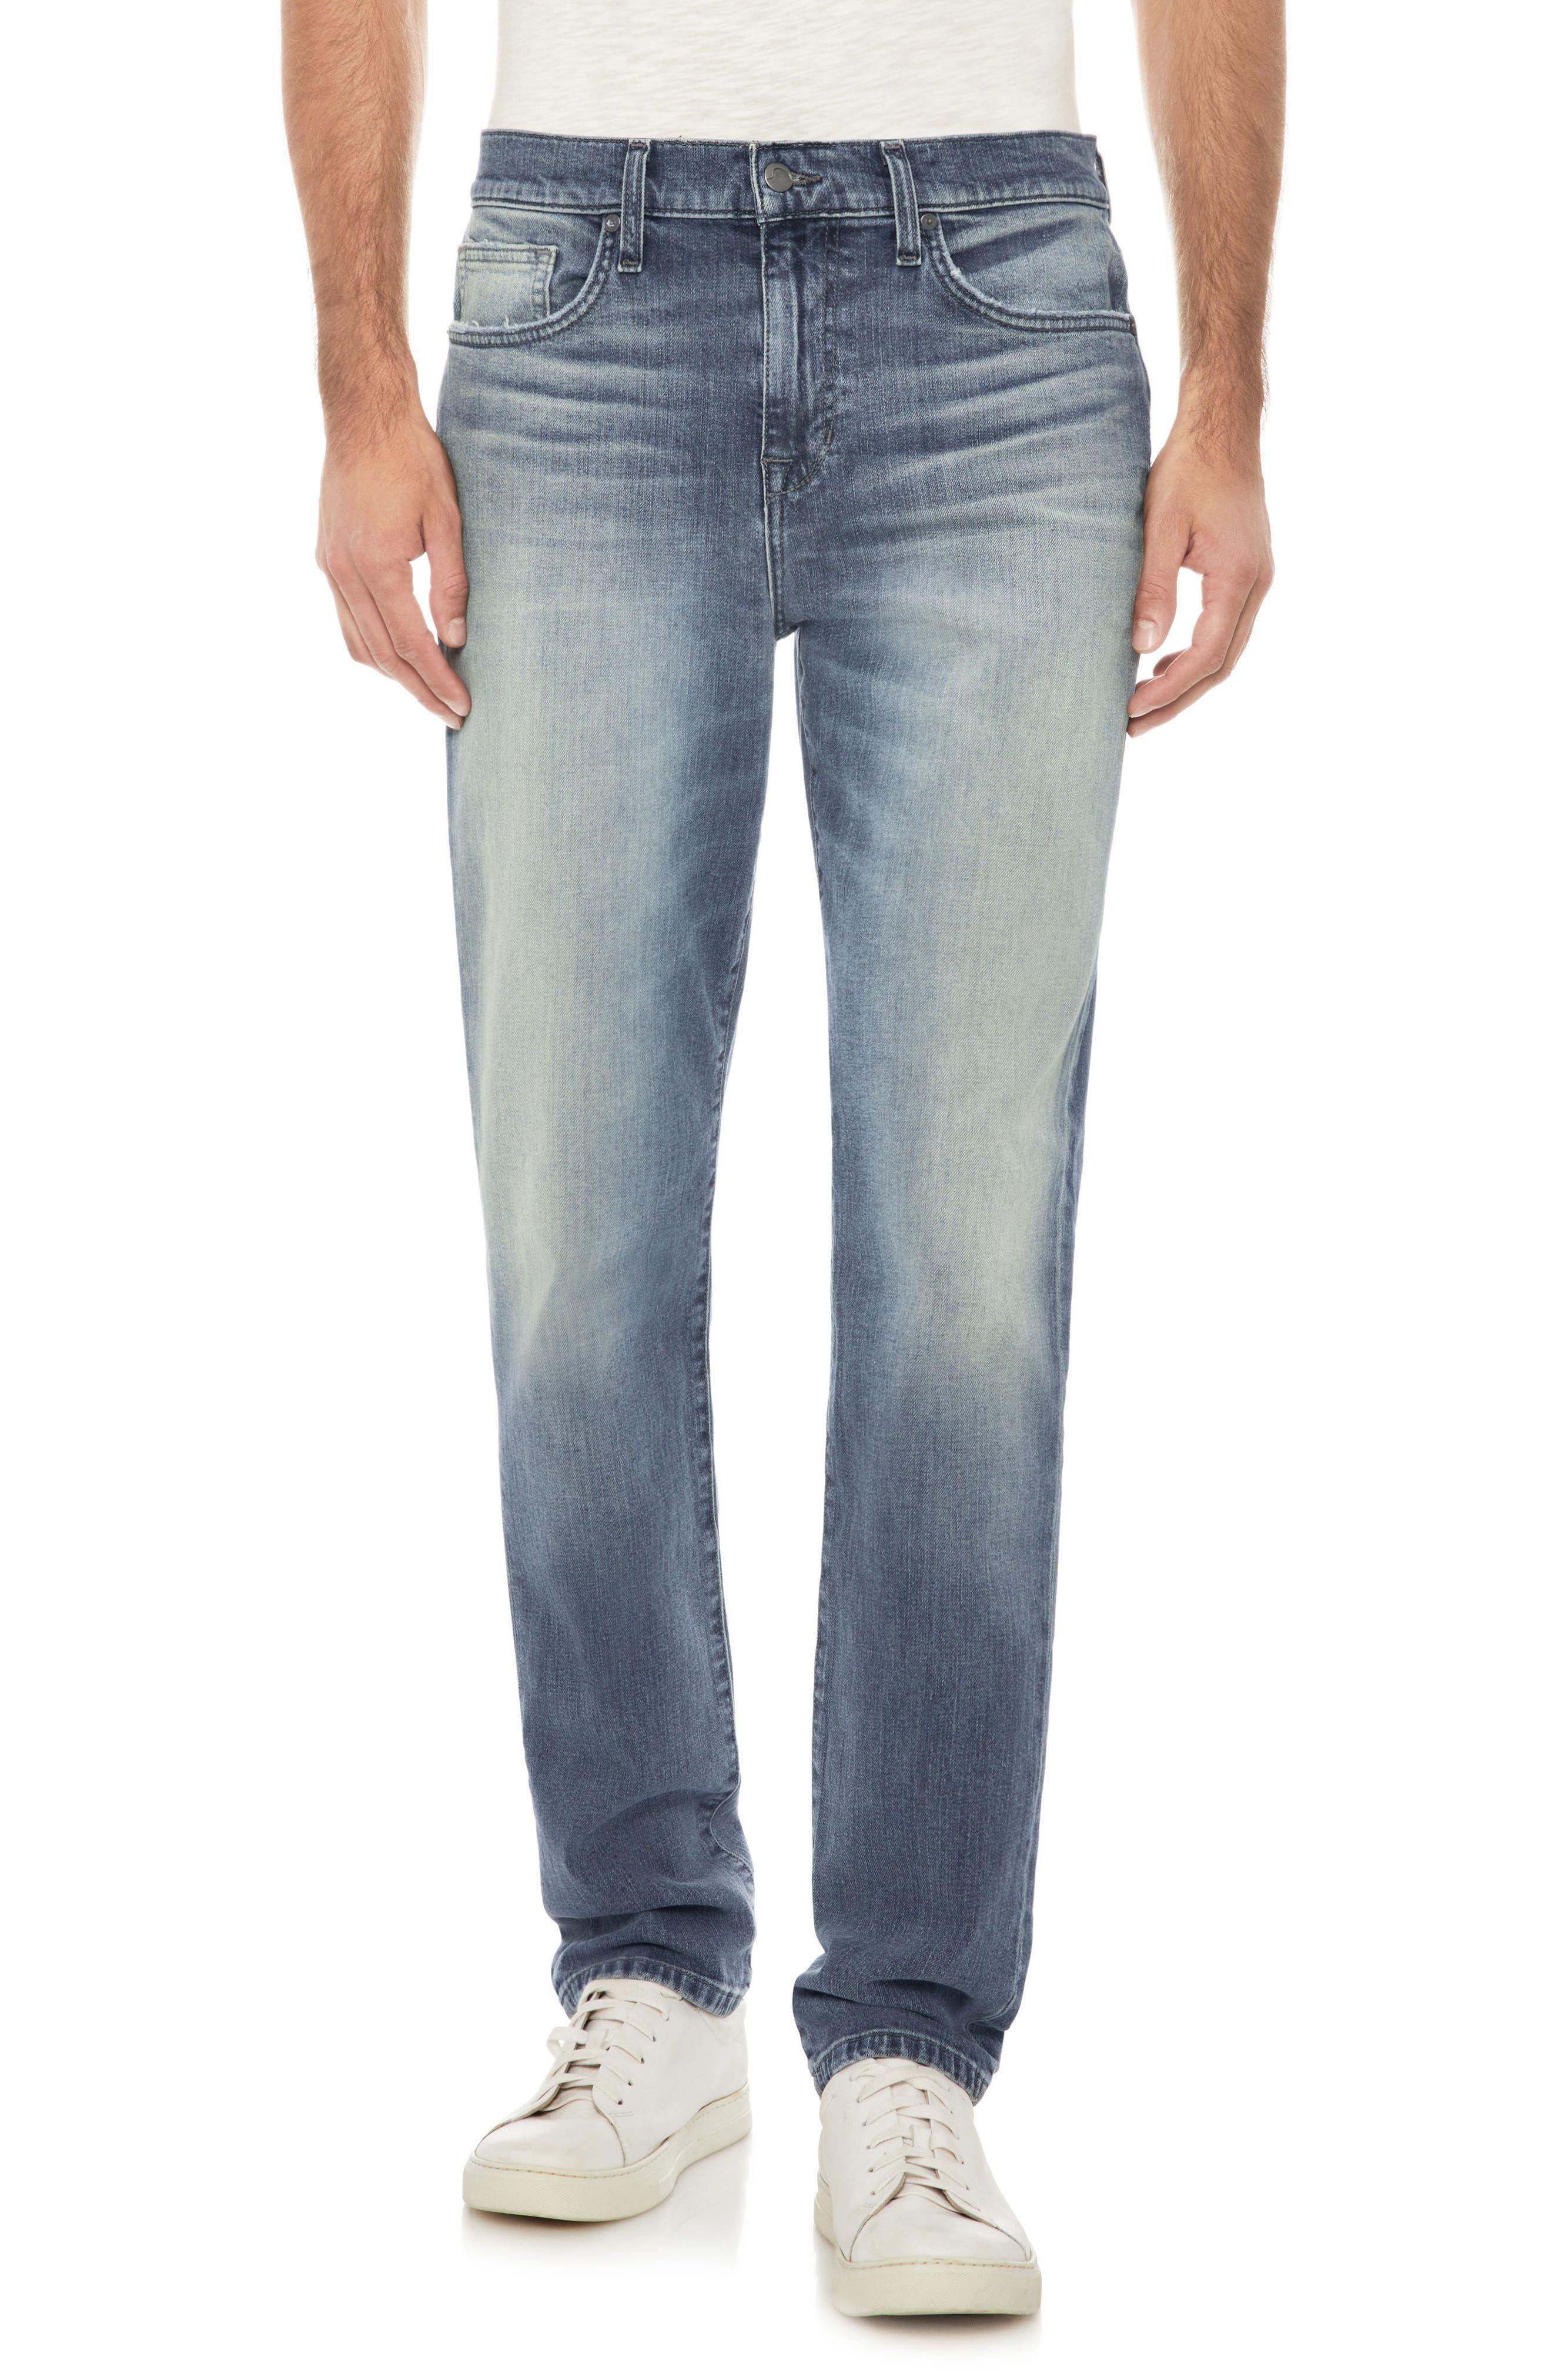 Folsom Slim Fit Jeans,                             Main thumbnail 1, color,                             400